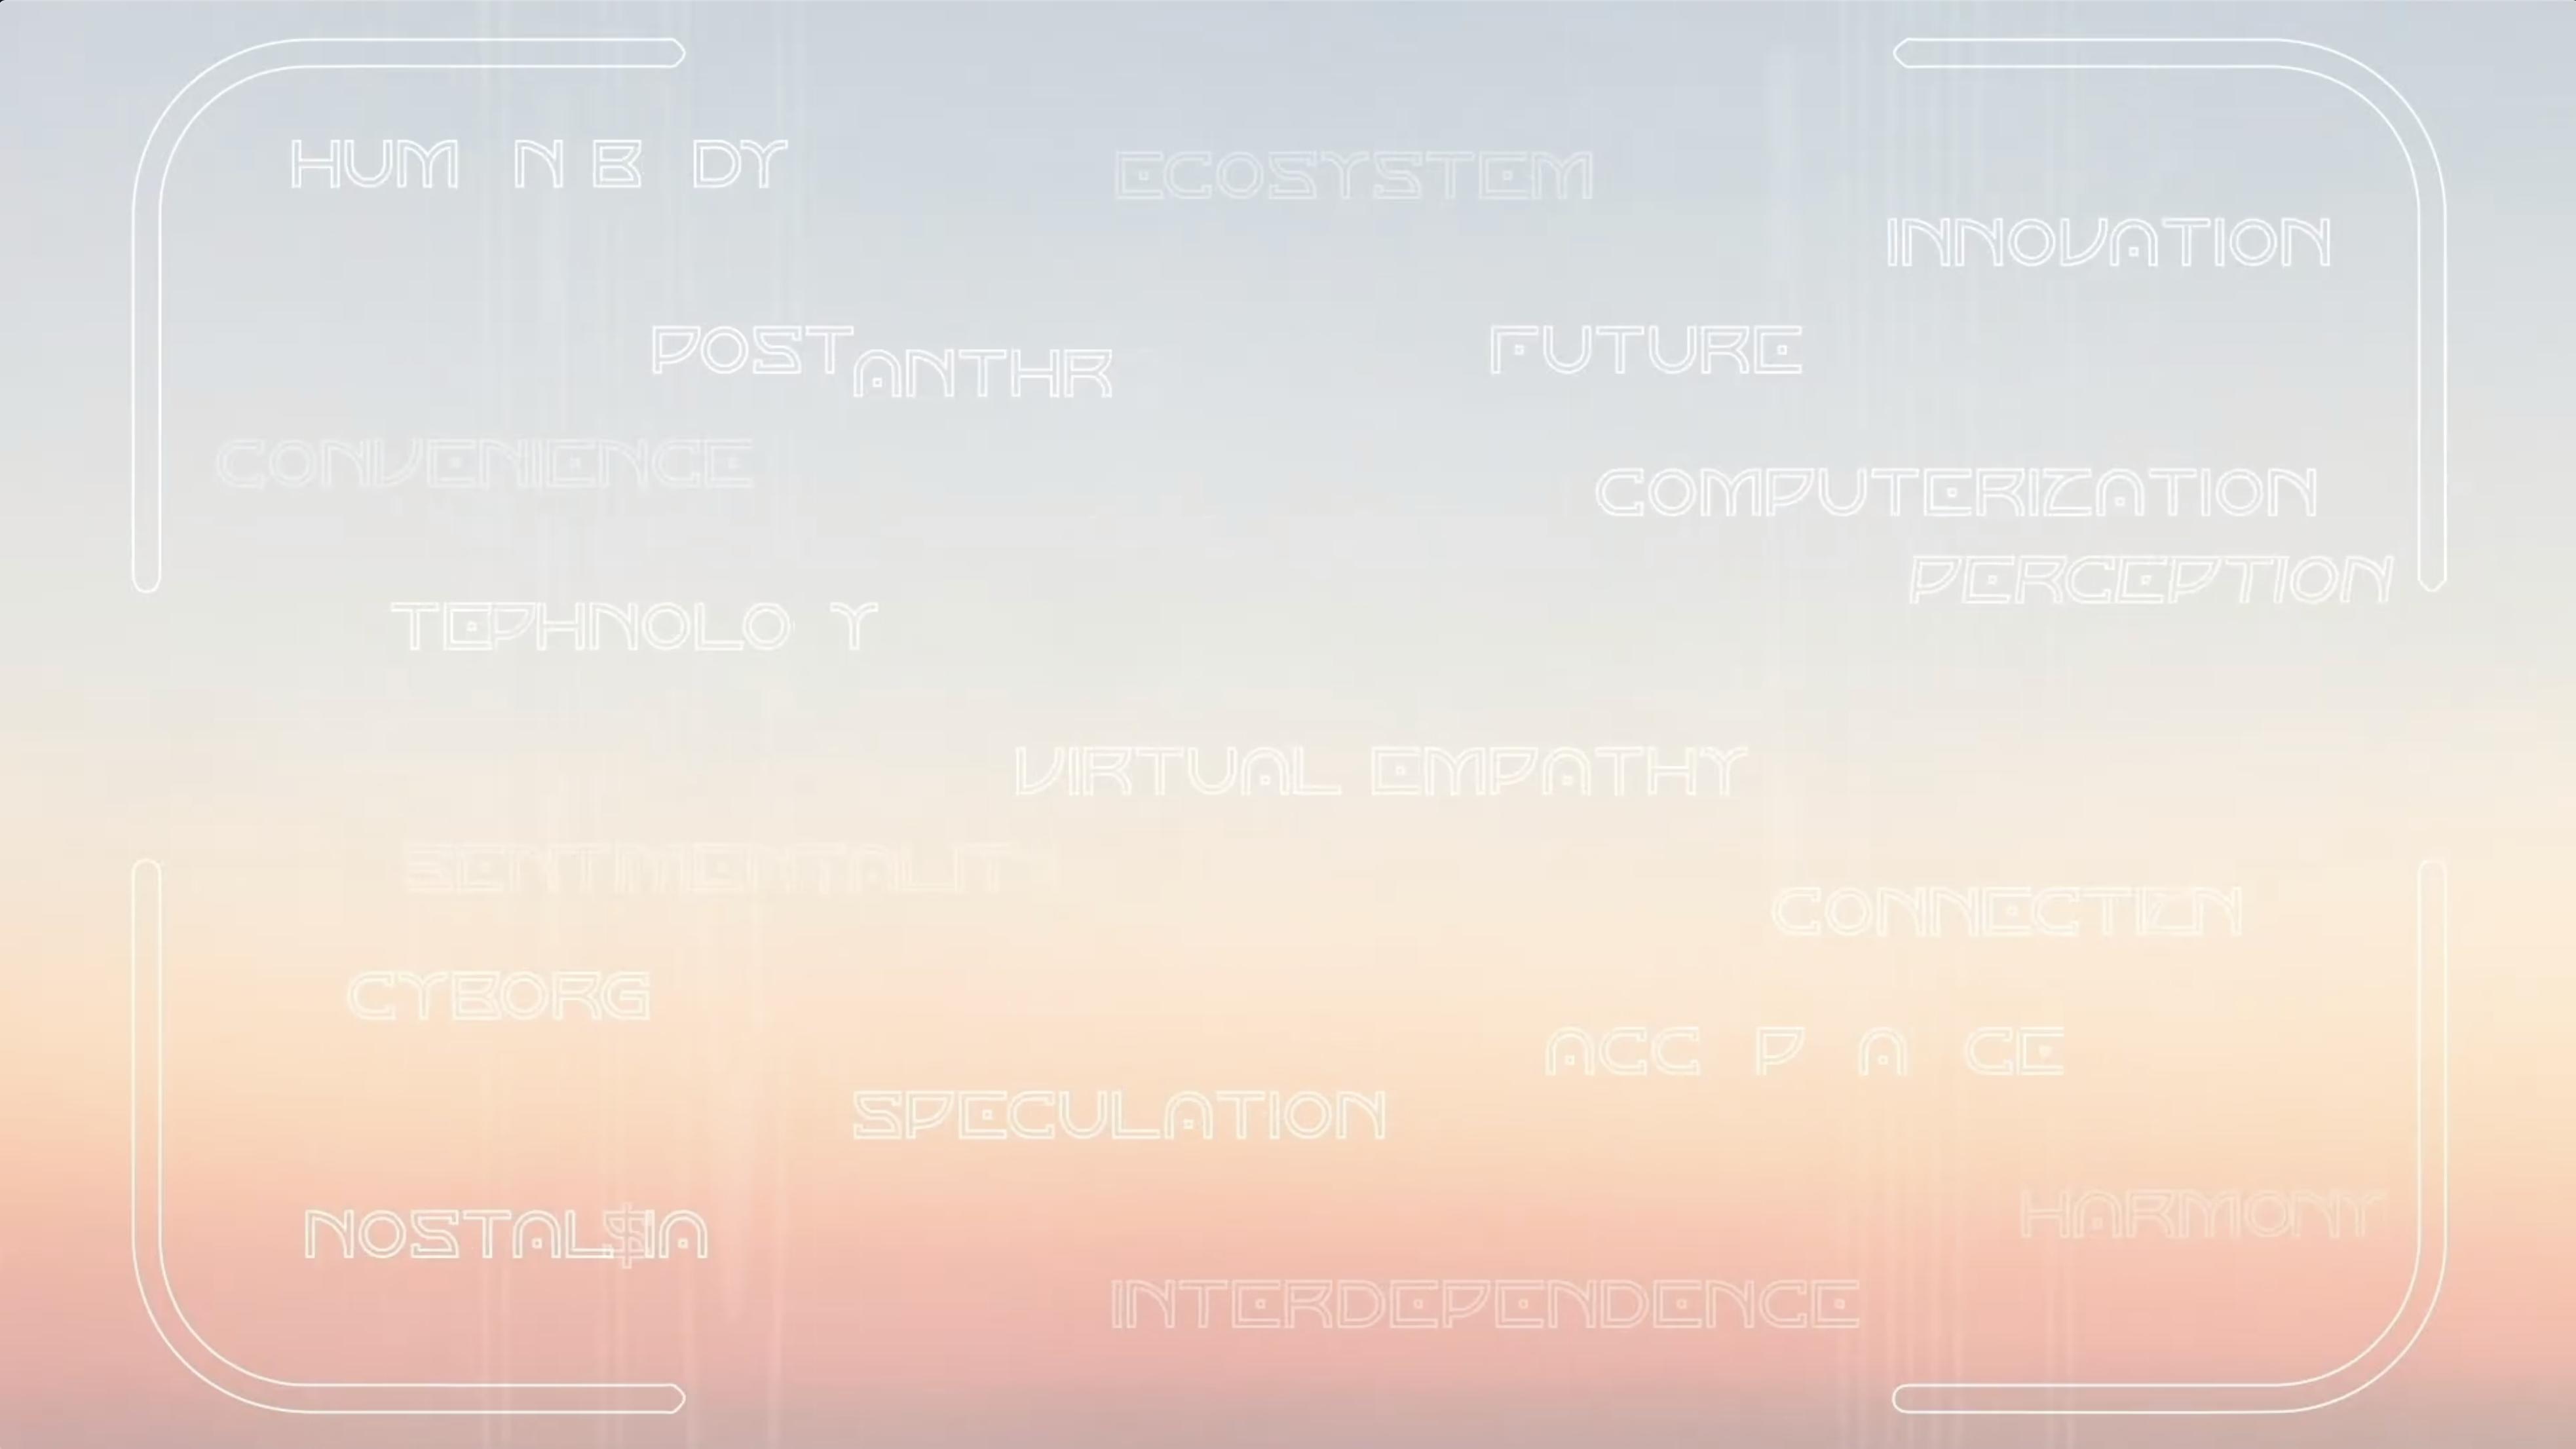 MAFD_GravityPostcards_02